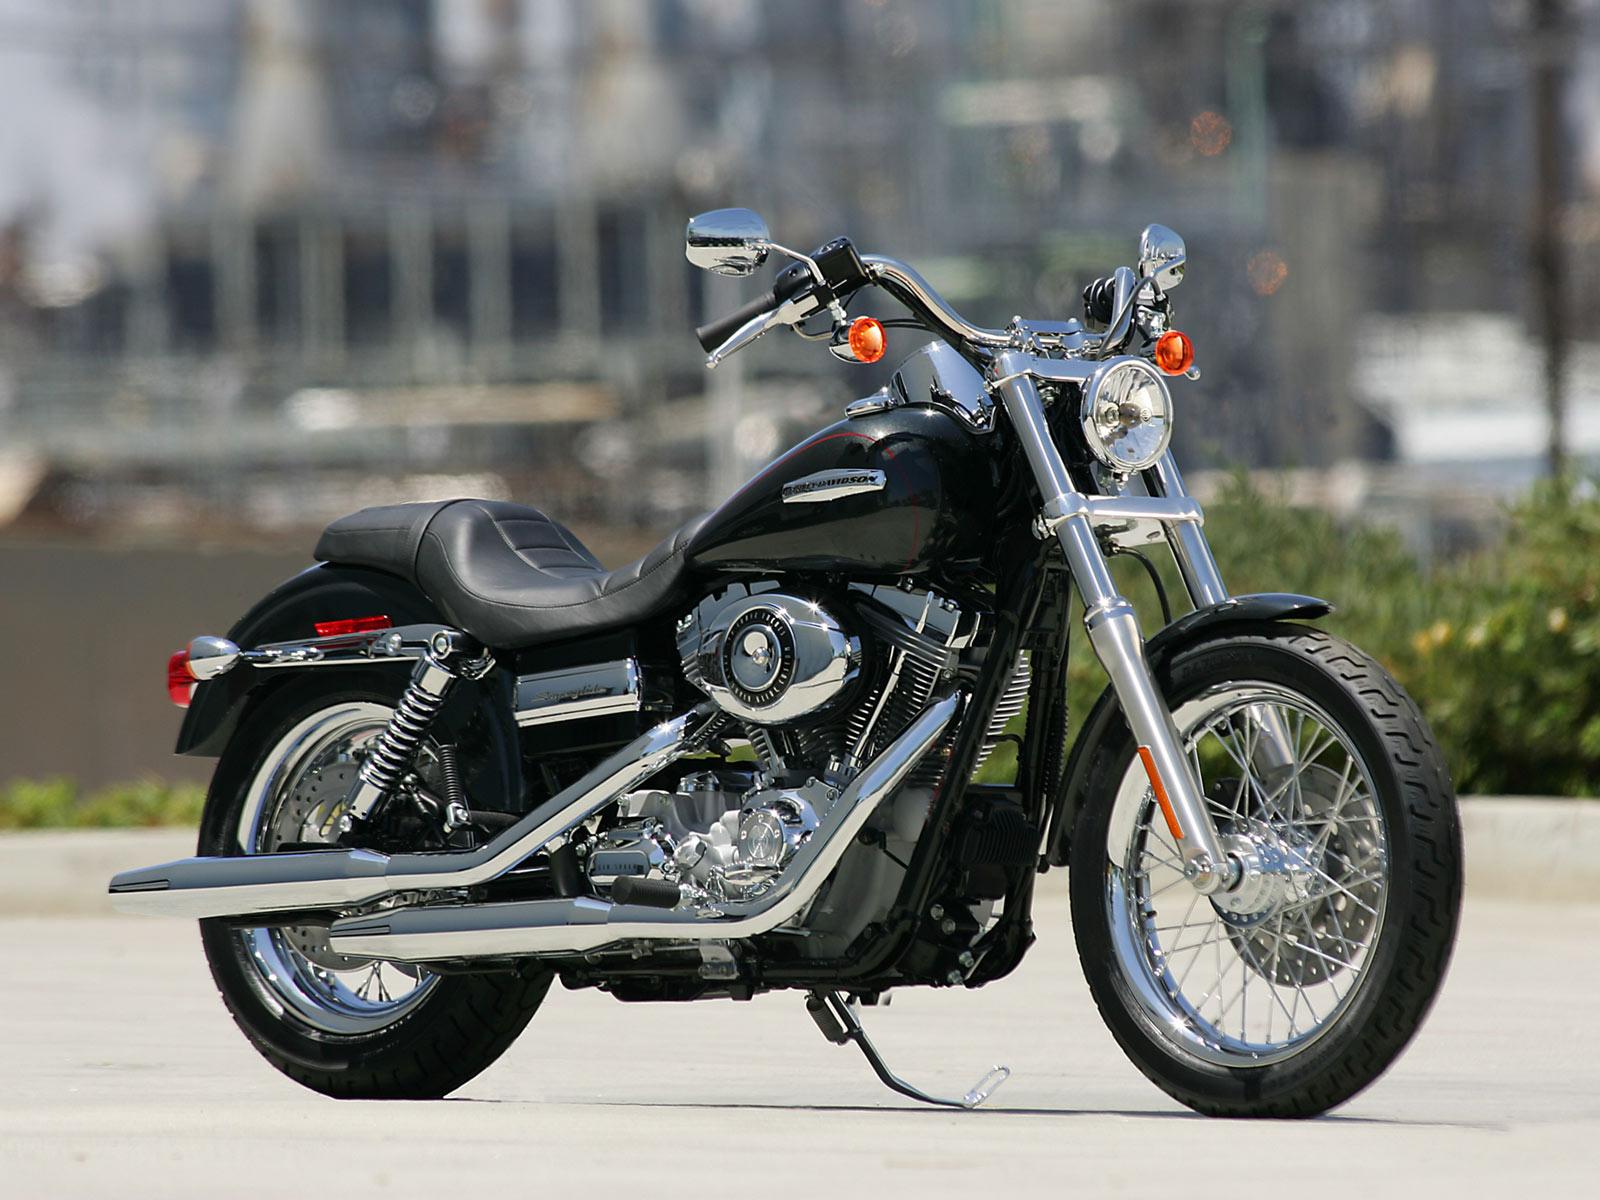 Desktop Inspiratoin: Harley Davidson Desktop Wallpaper